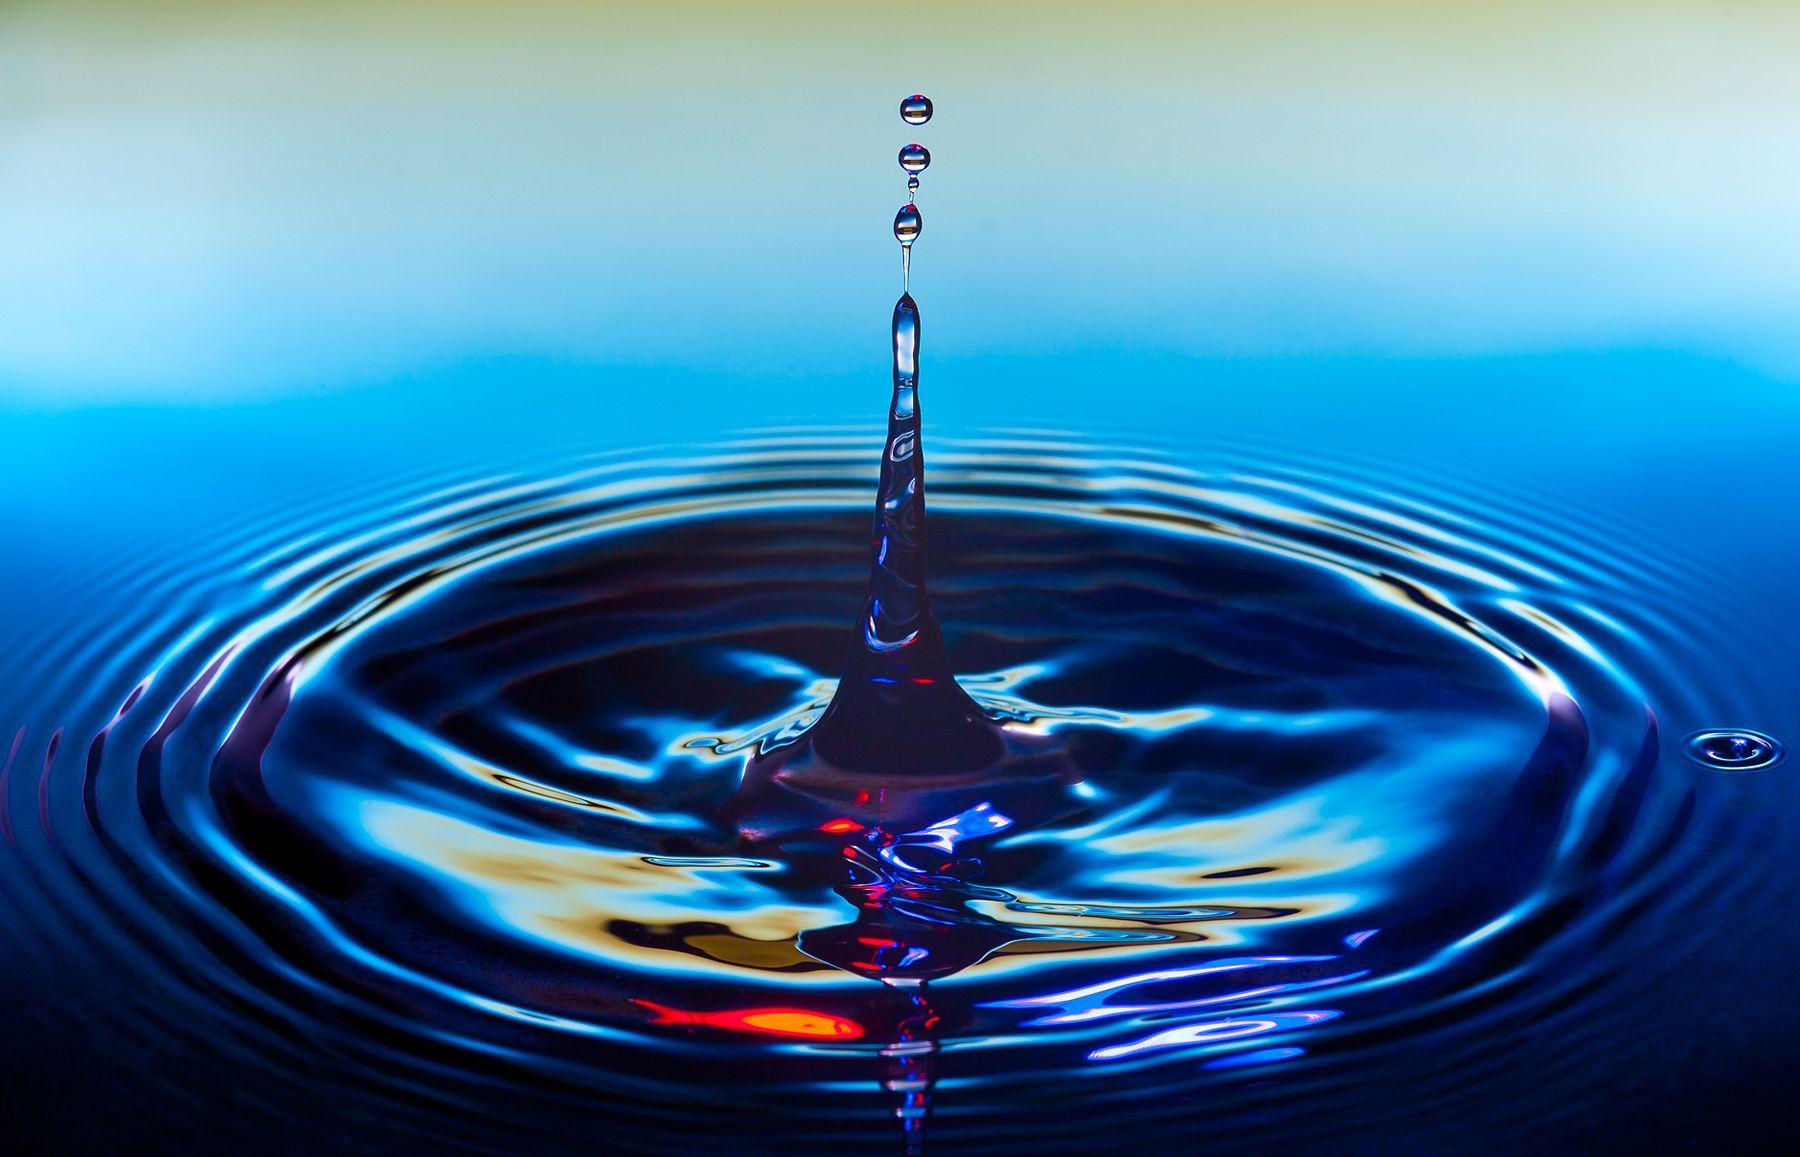 1fluidity_05.jpg